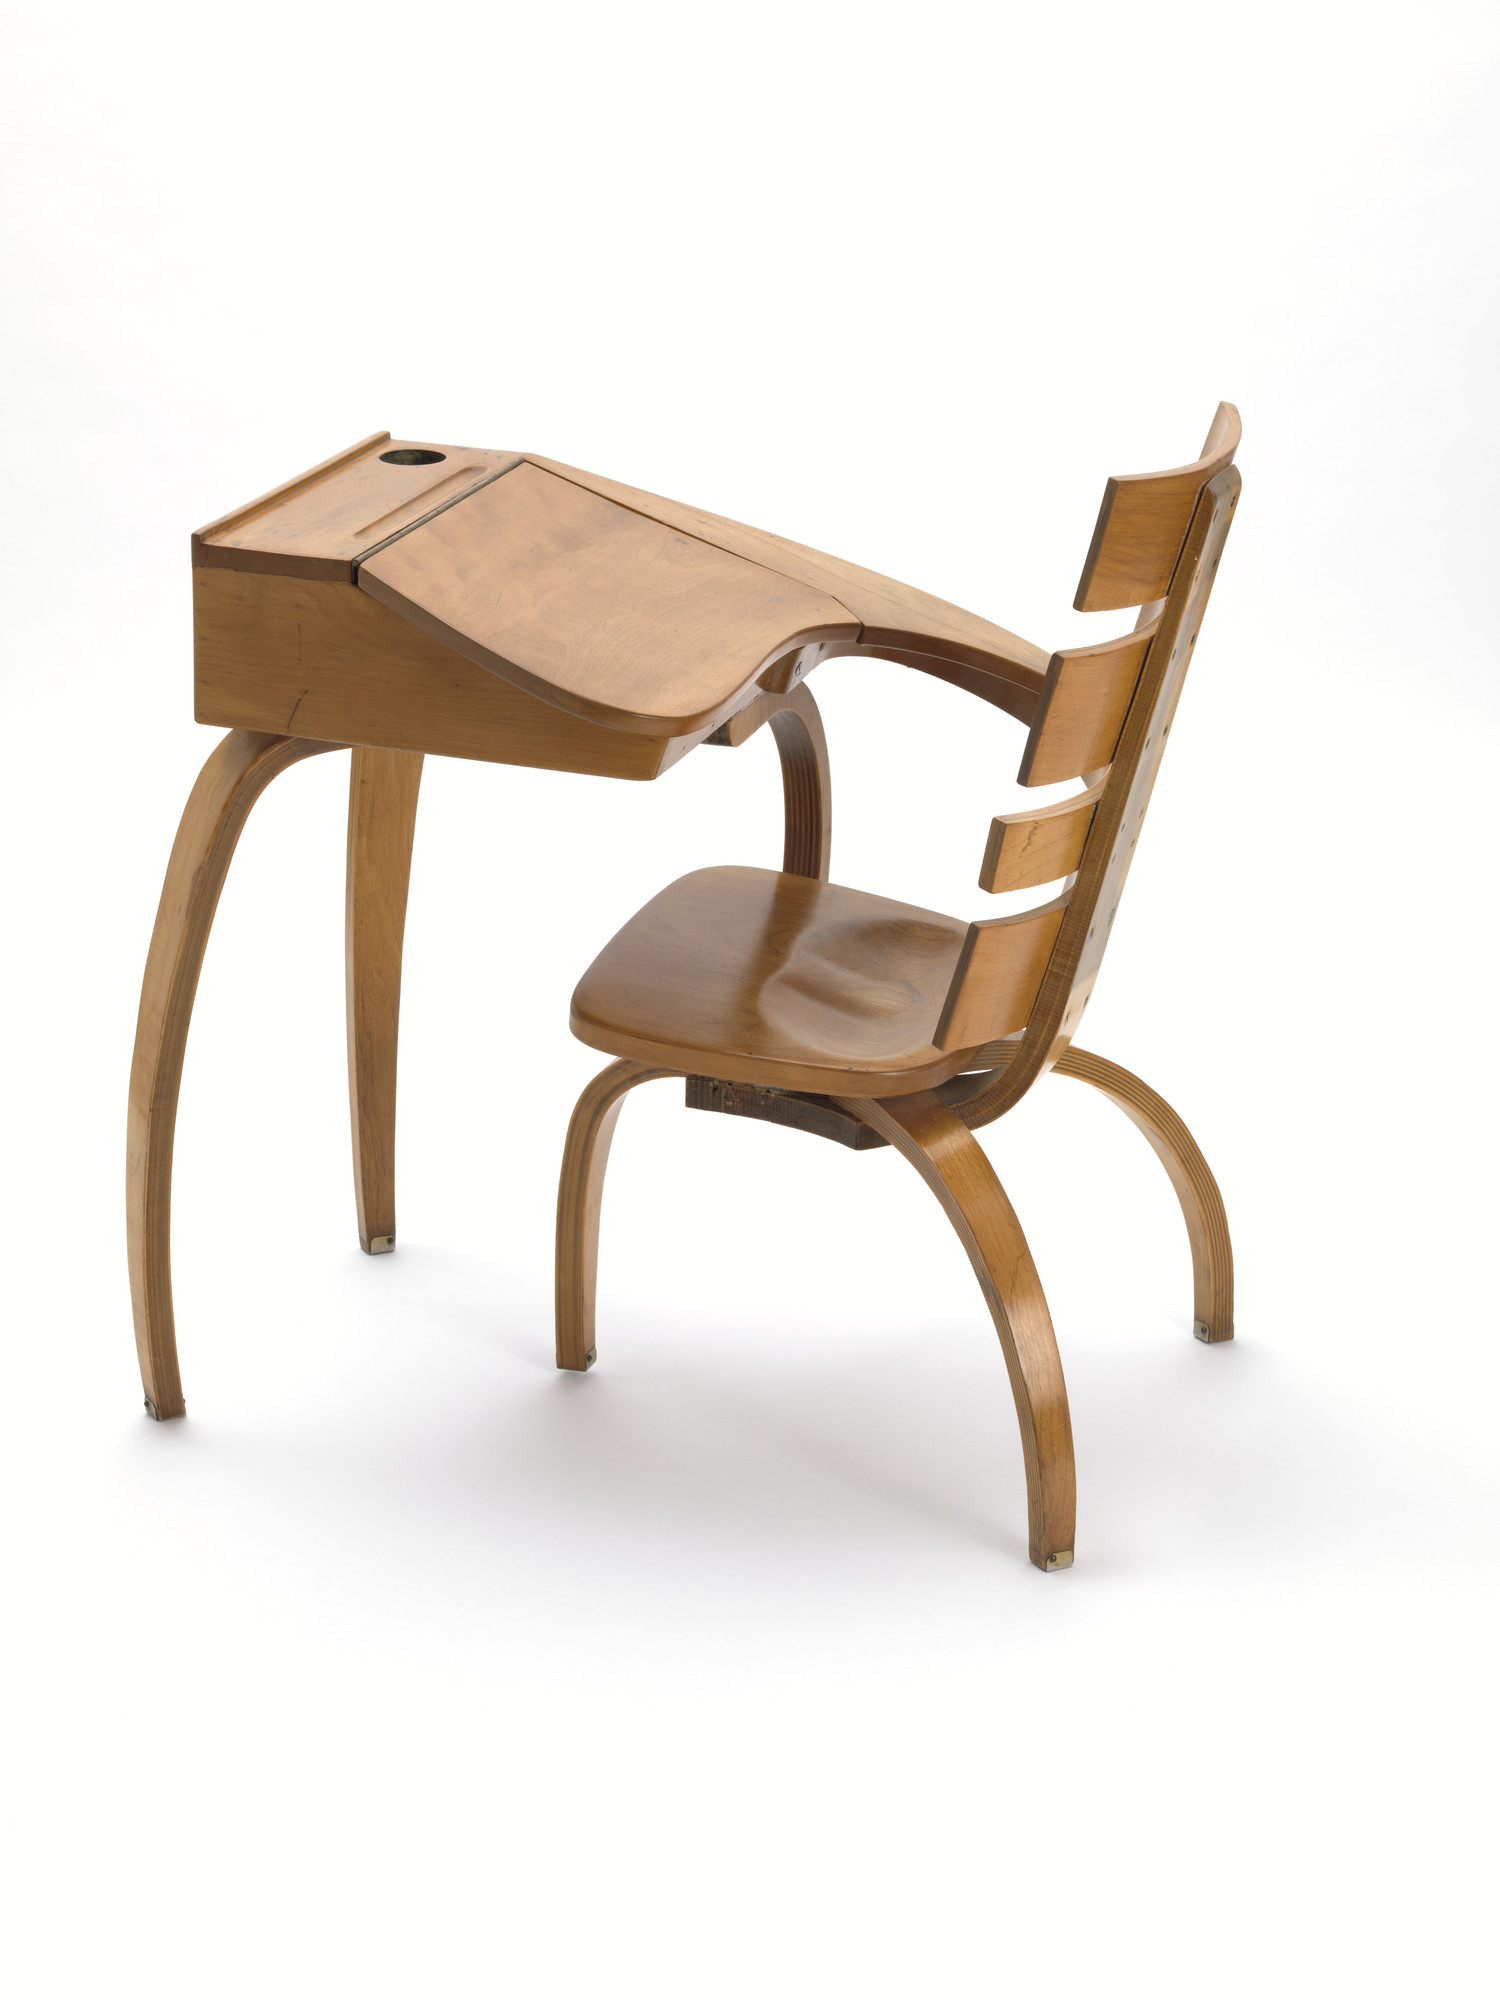 frederick markus paul nocka prototype desk for the bowditch school salem ma 1946 moma frederick markus paul nocka prototype